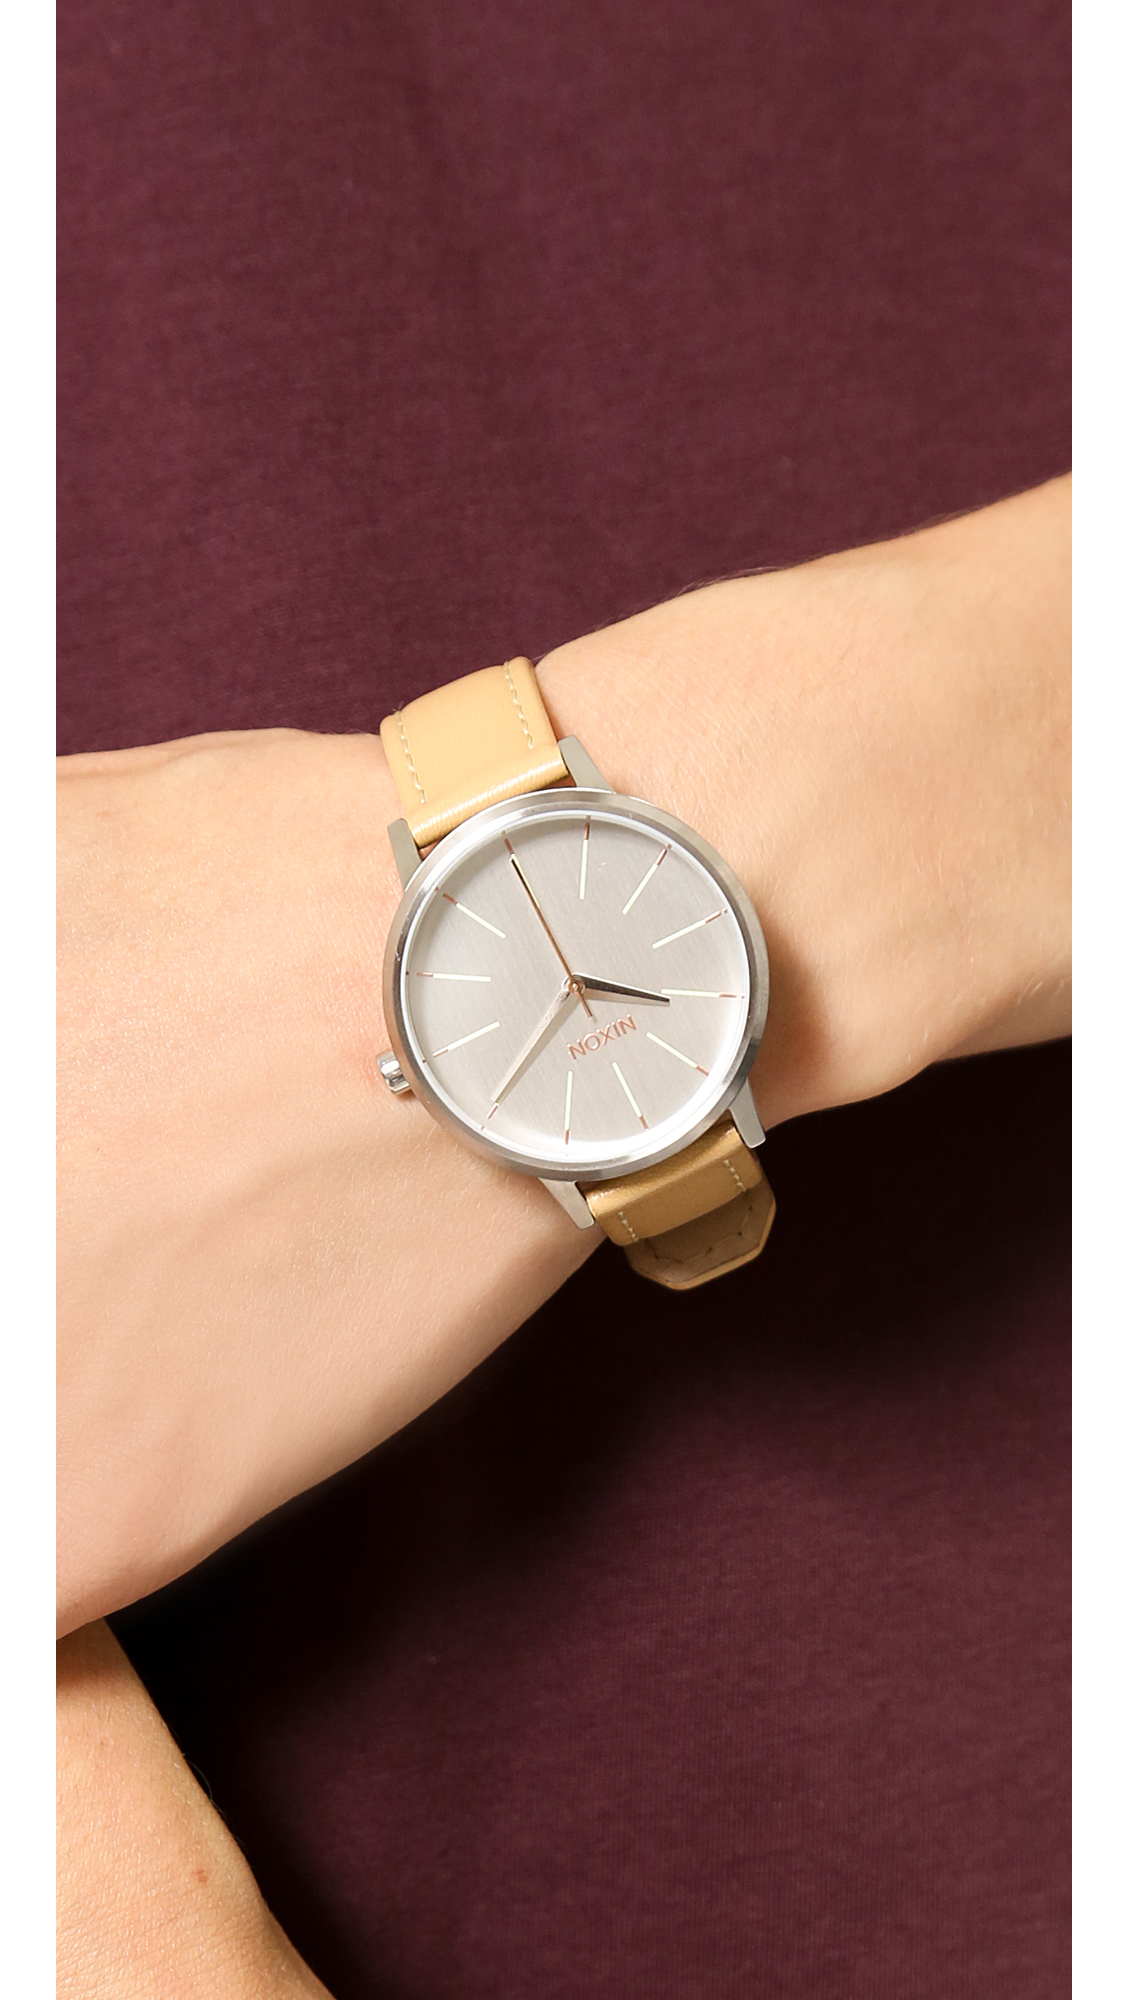 064f7fbf4 Nixon Kensington Leather Watch | SHOPBOP